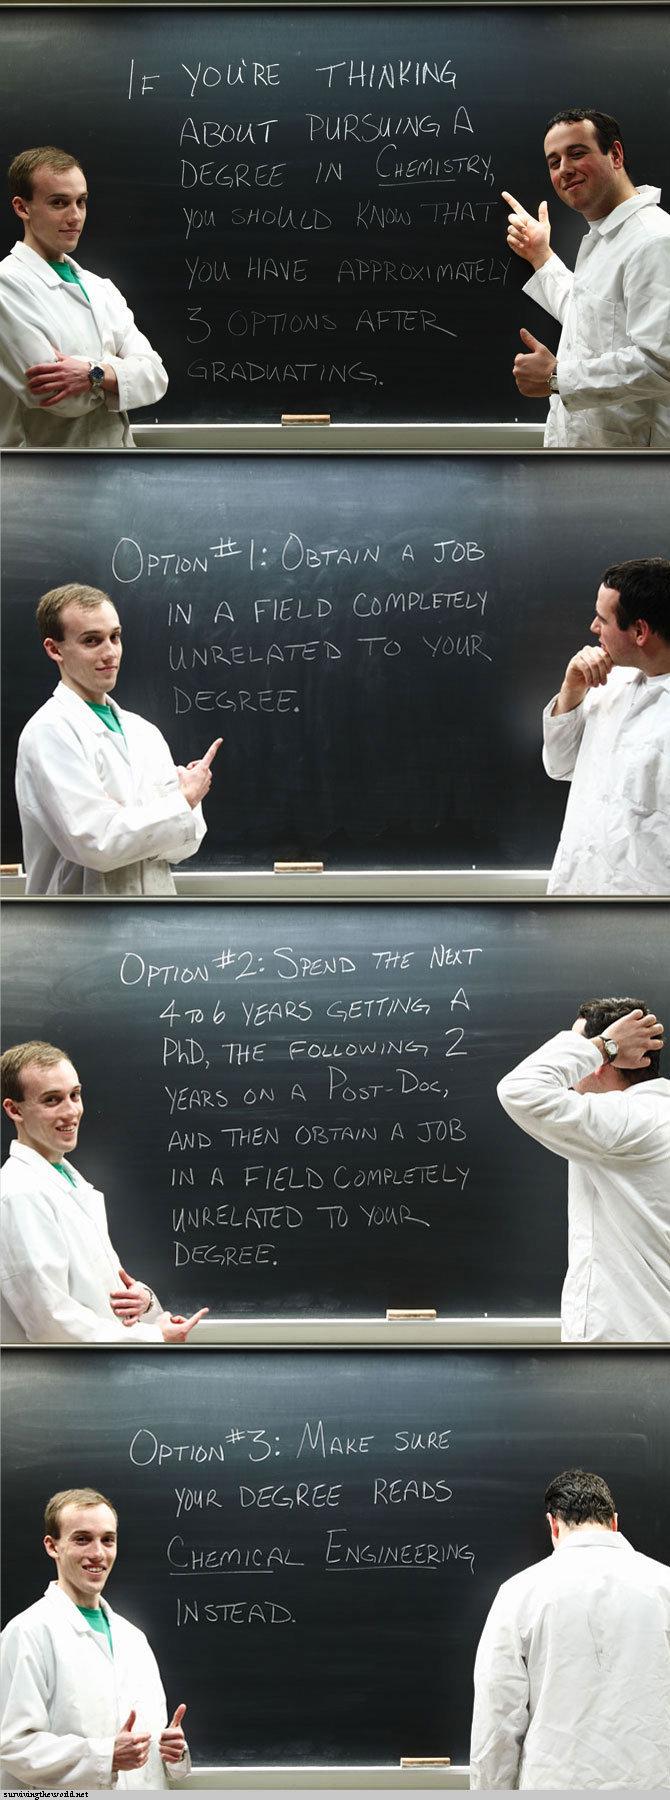 Chemistry. .. Option #4: Cook Meth. Chemistry Option #4: Cook Meth